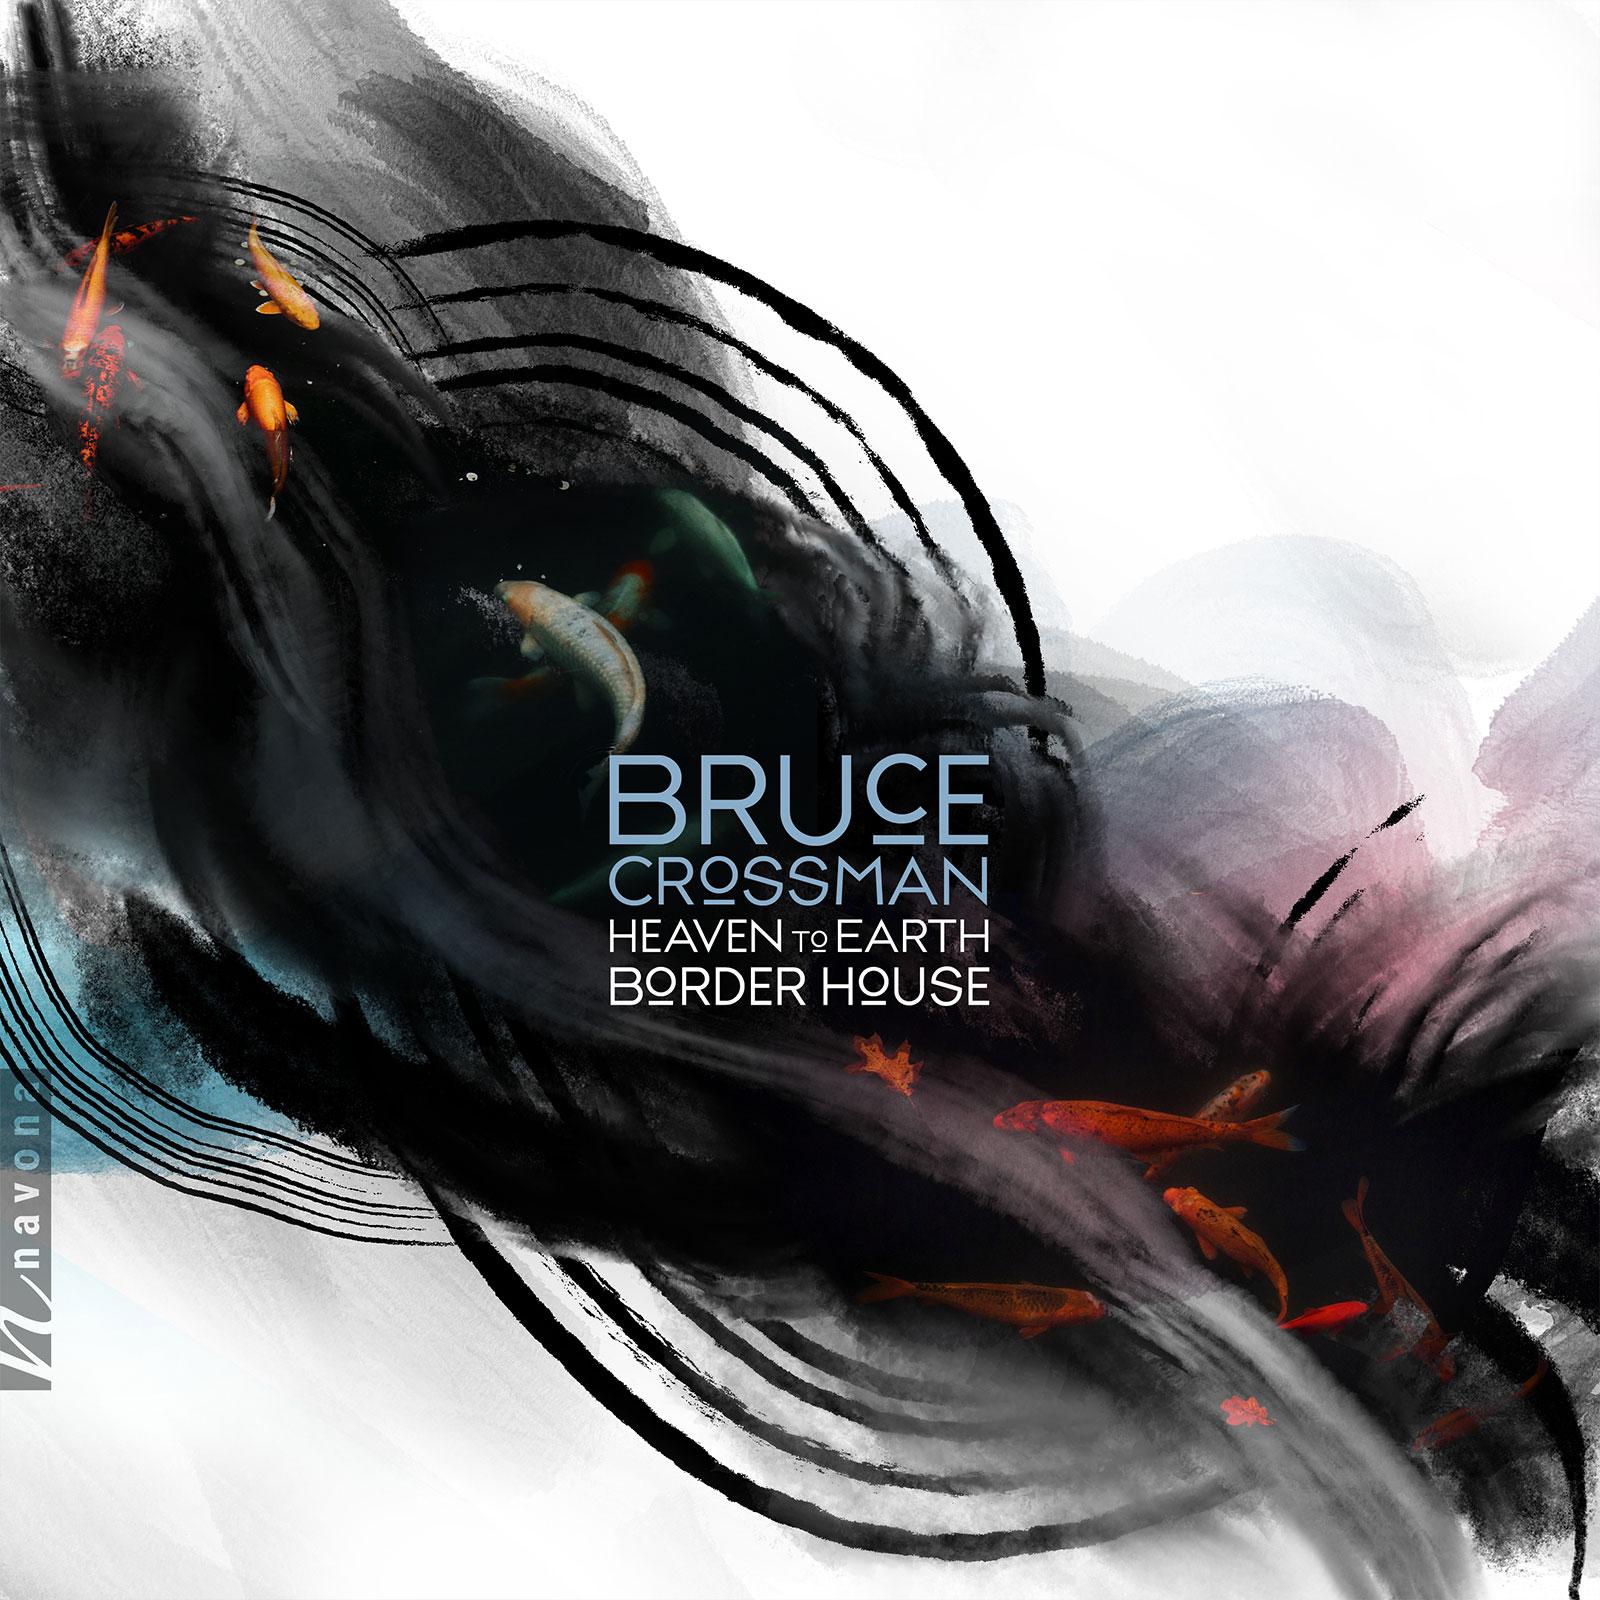 HEAVEN TO EARTH BORDER HOUSE - Bruce Crossman - Album Cover